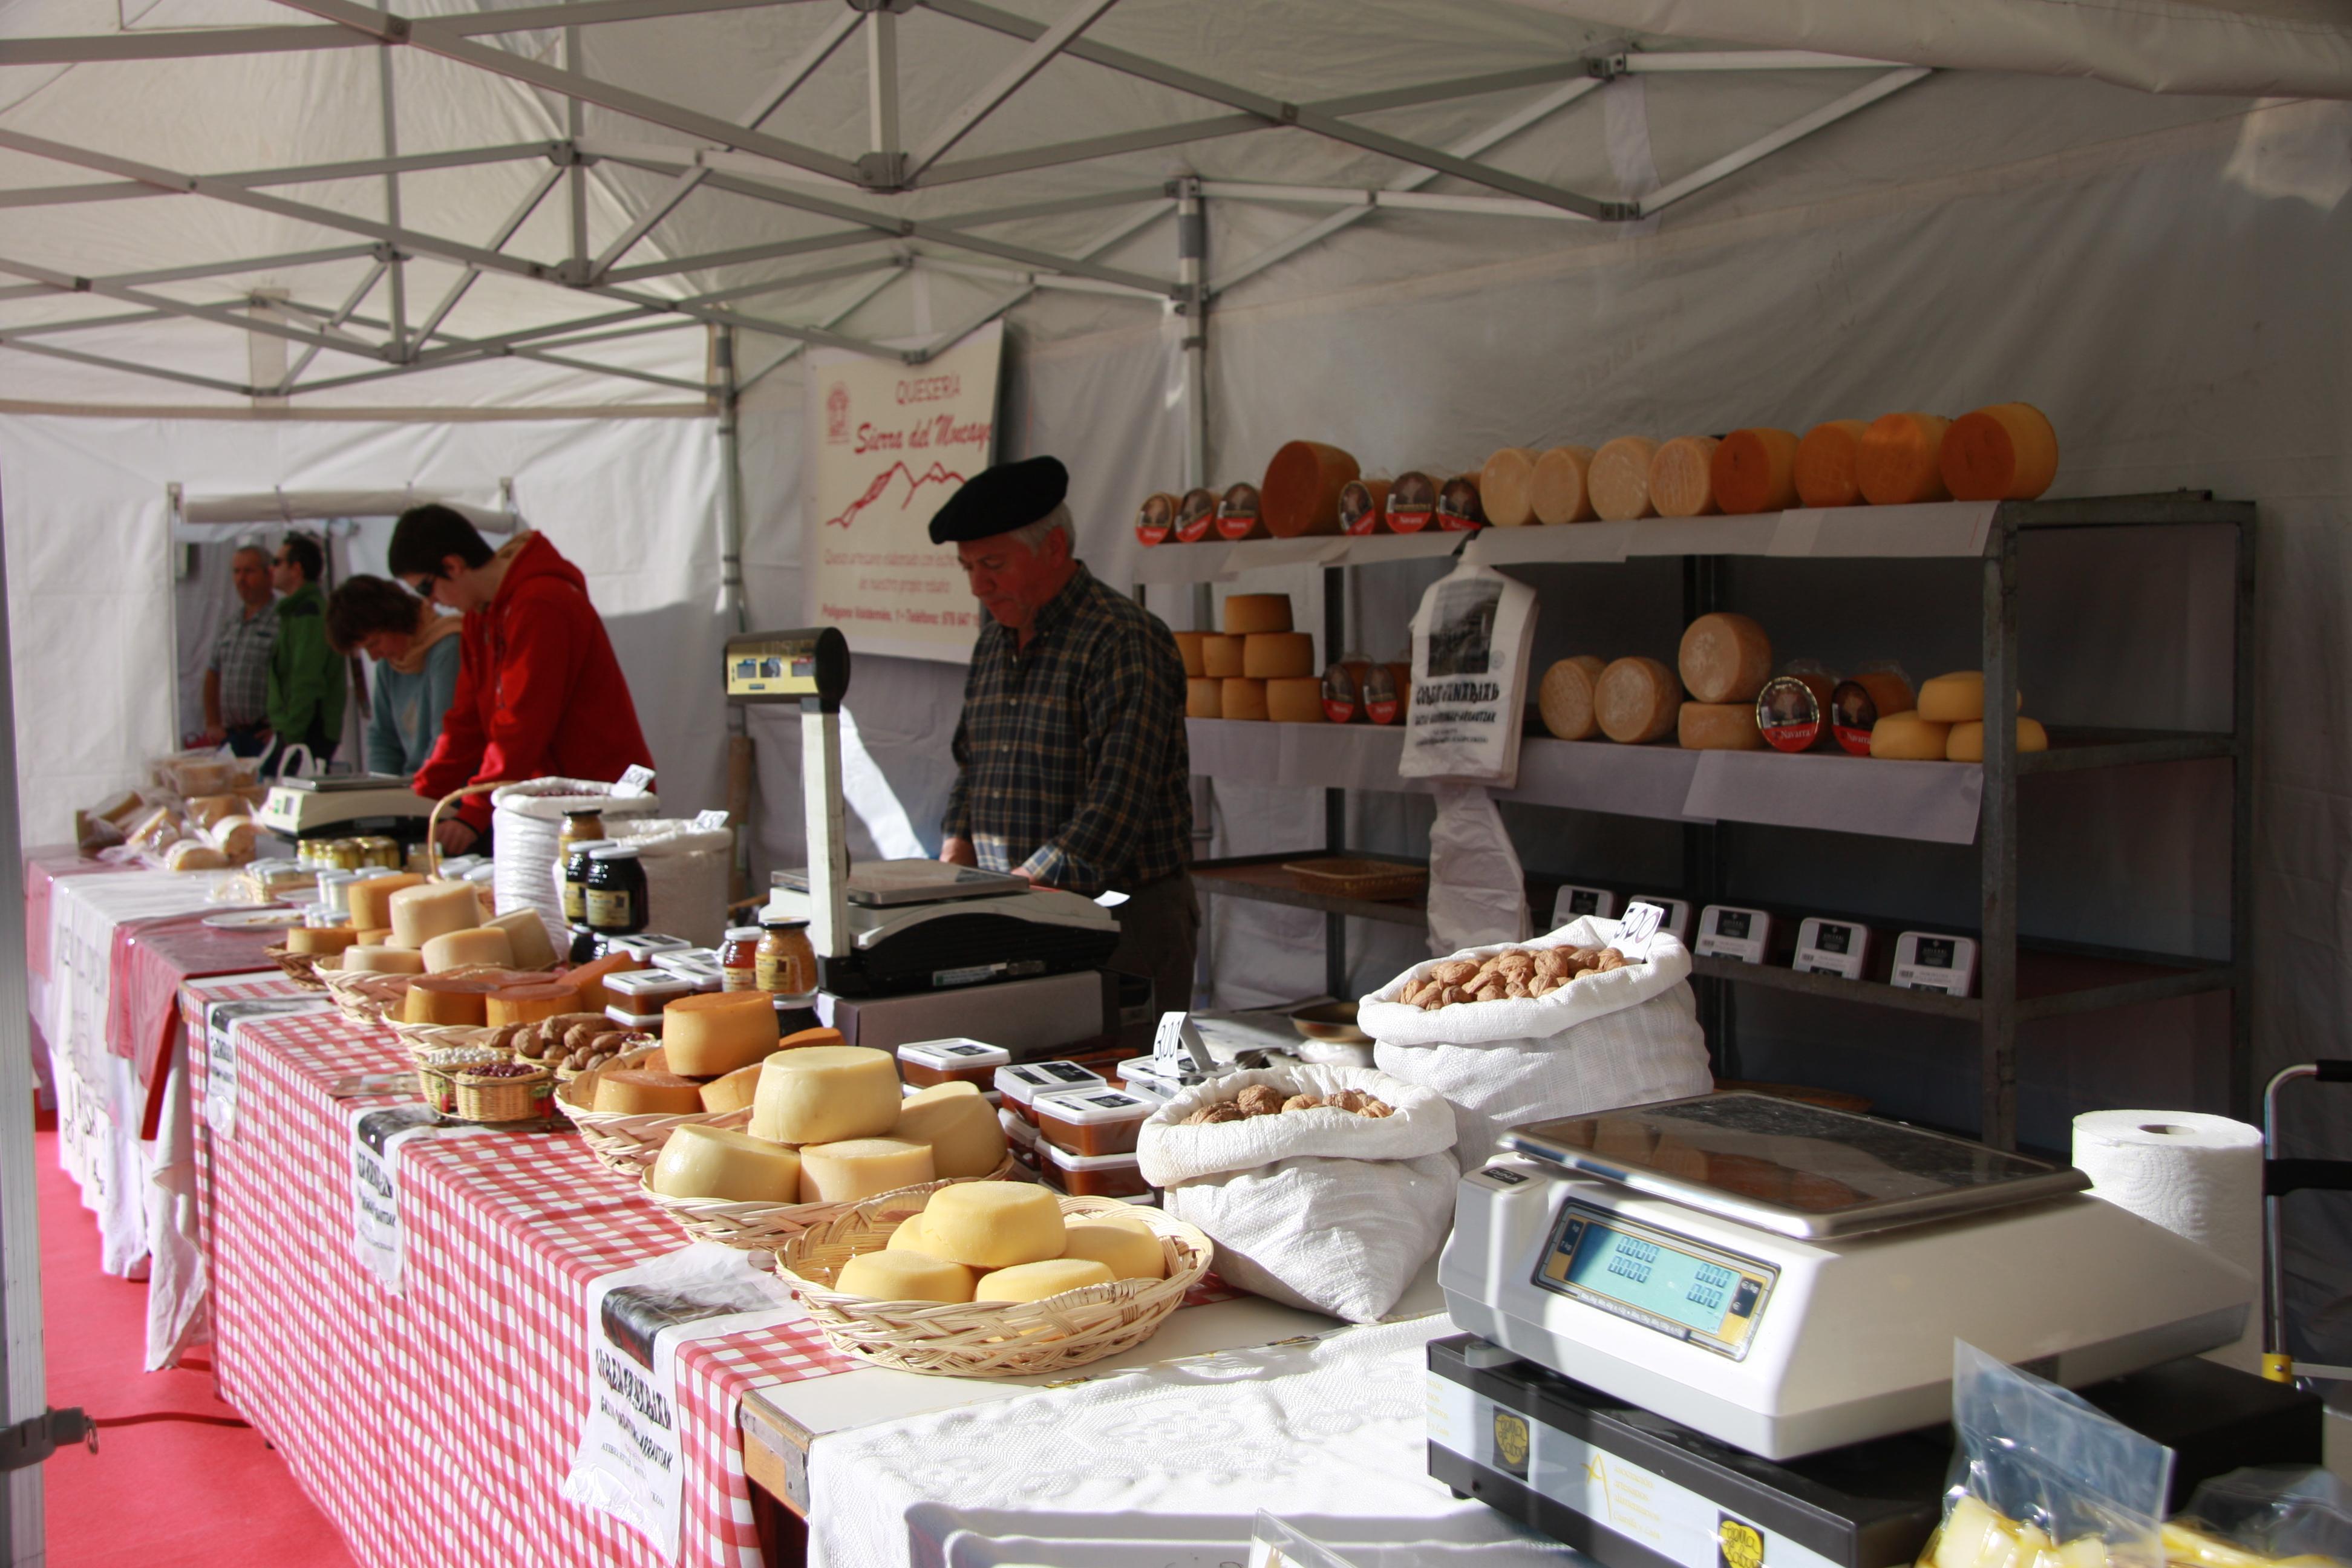 LR_5_11_1_Feria-del-queso-de-munilla1.jpg